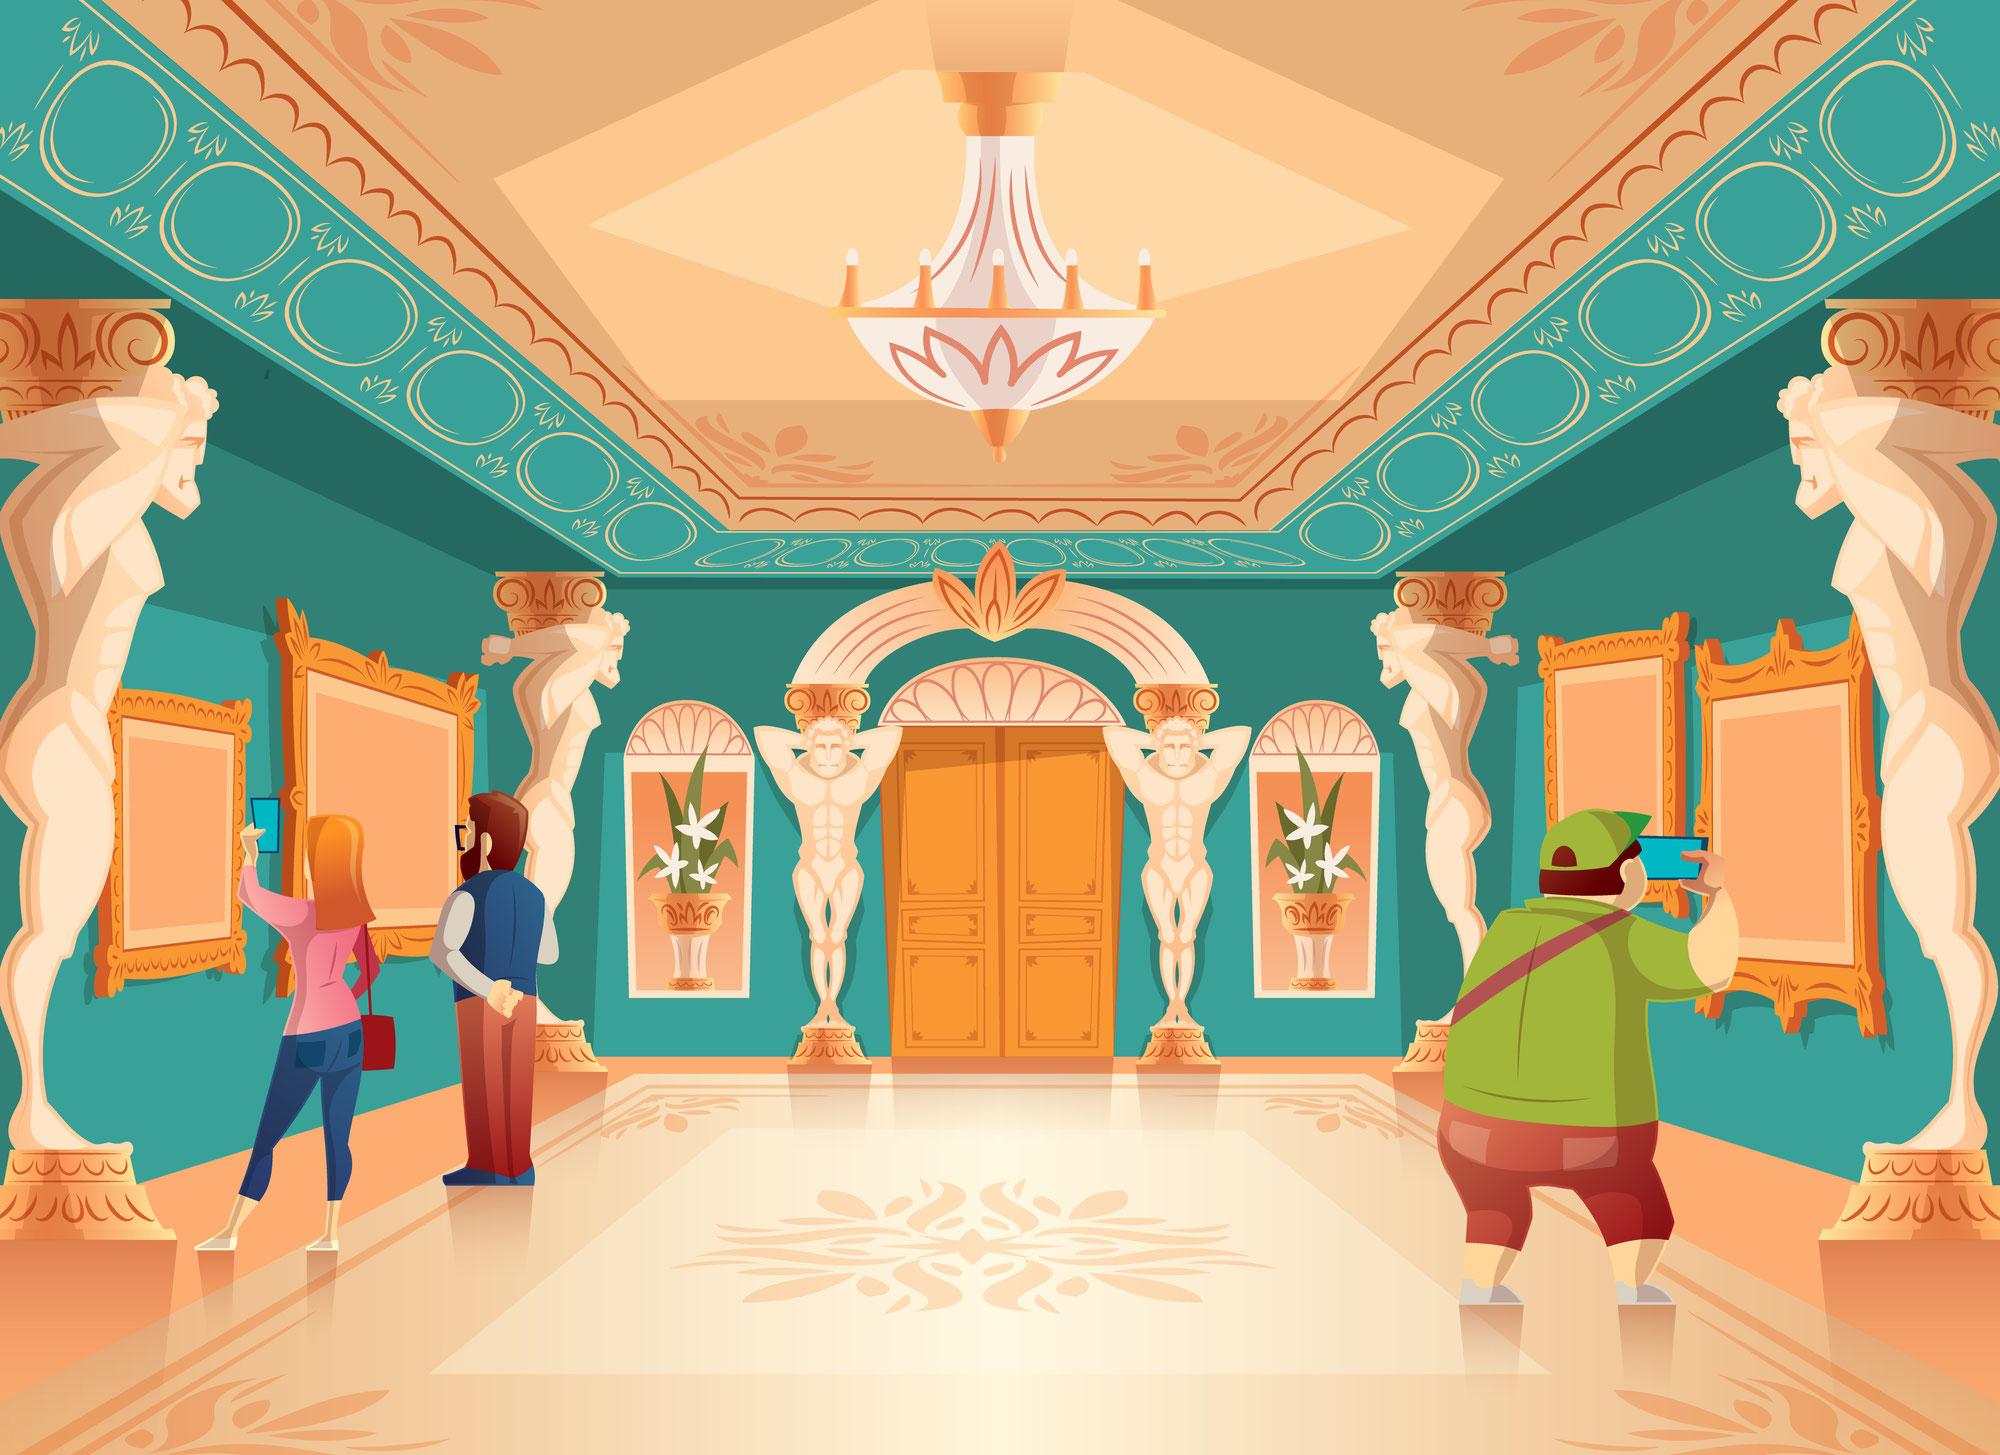 Galerie abstrakt öffnet bald !